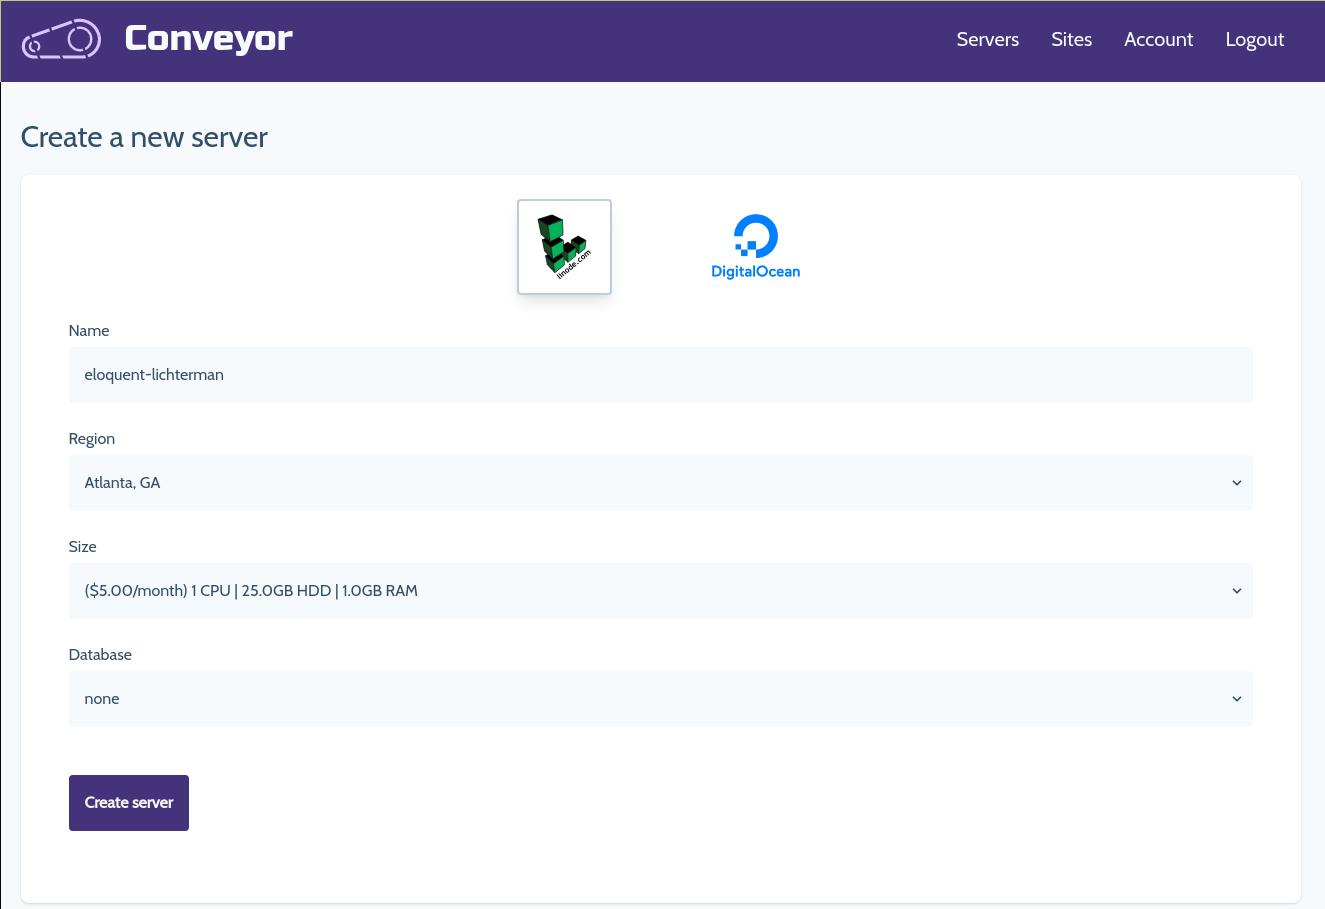 Create new server